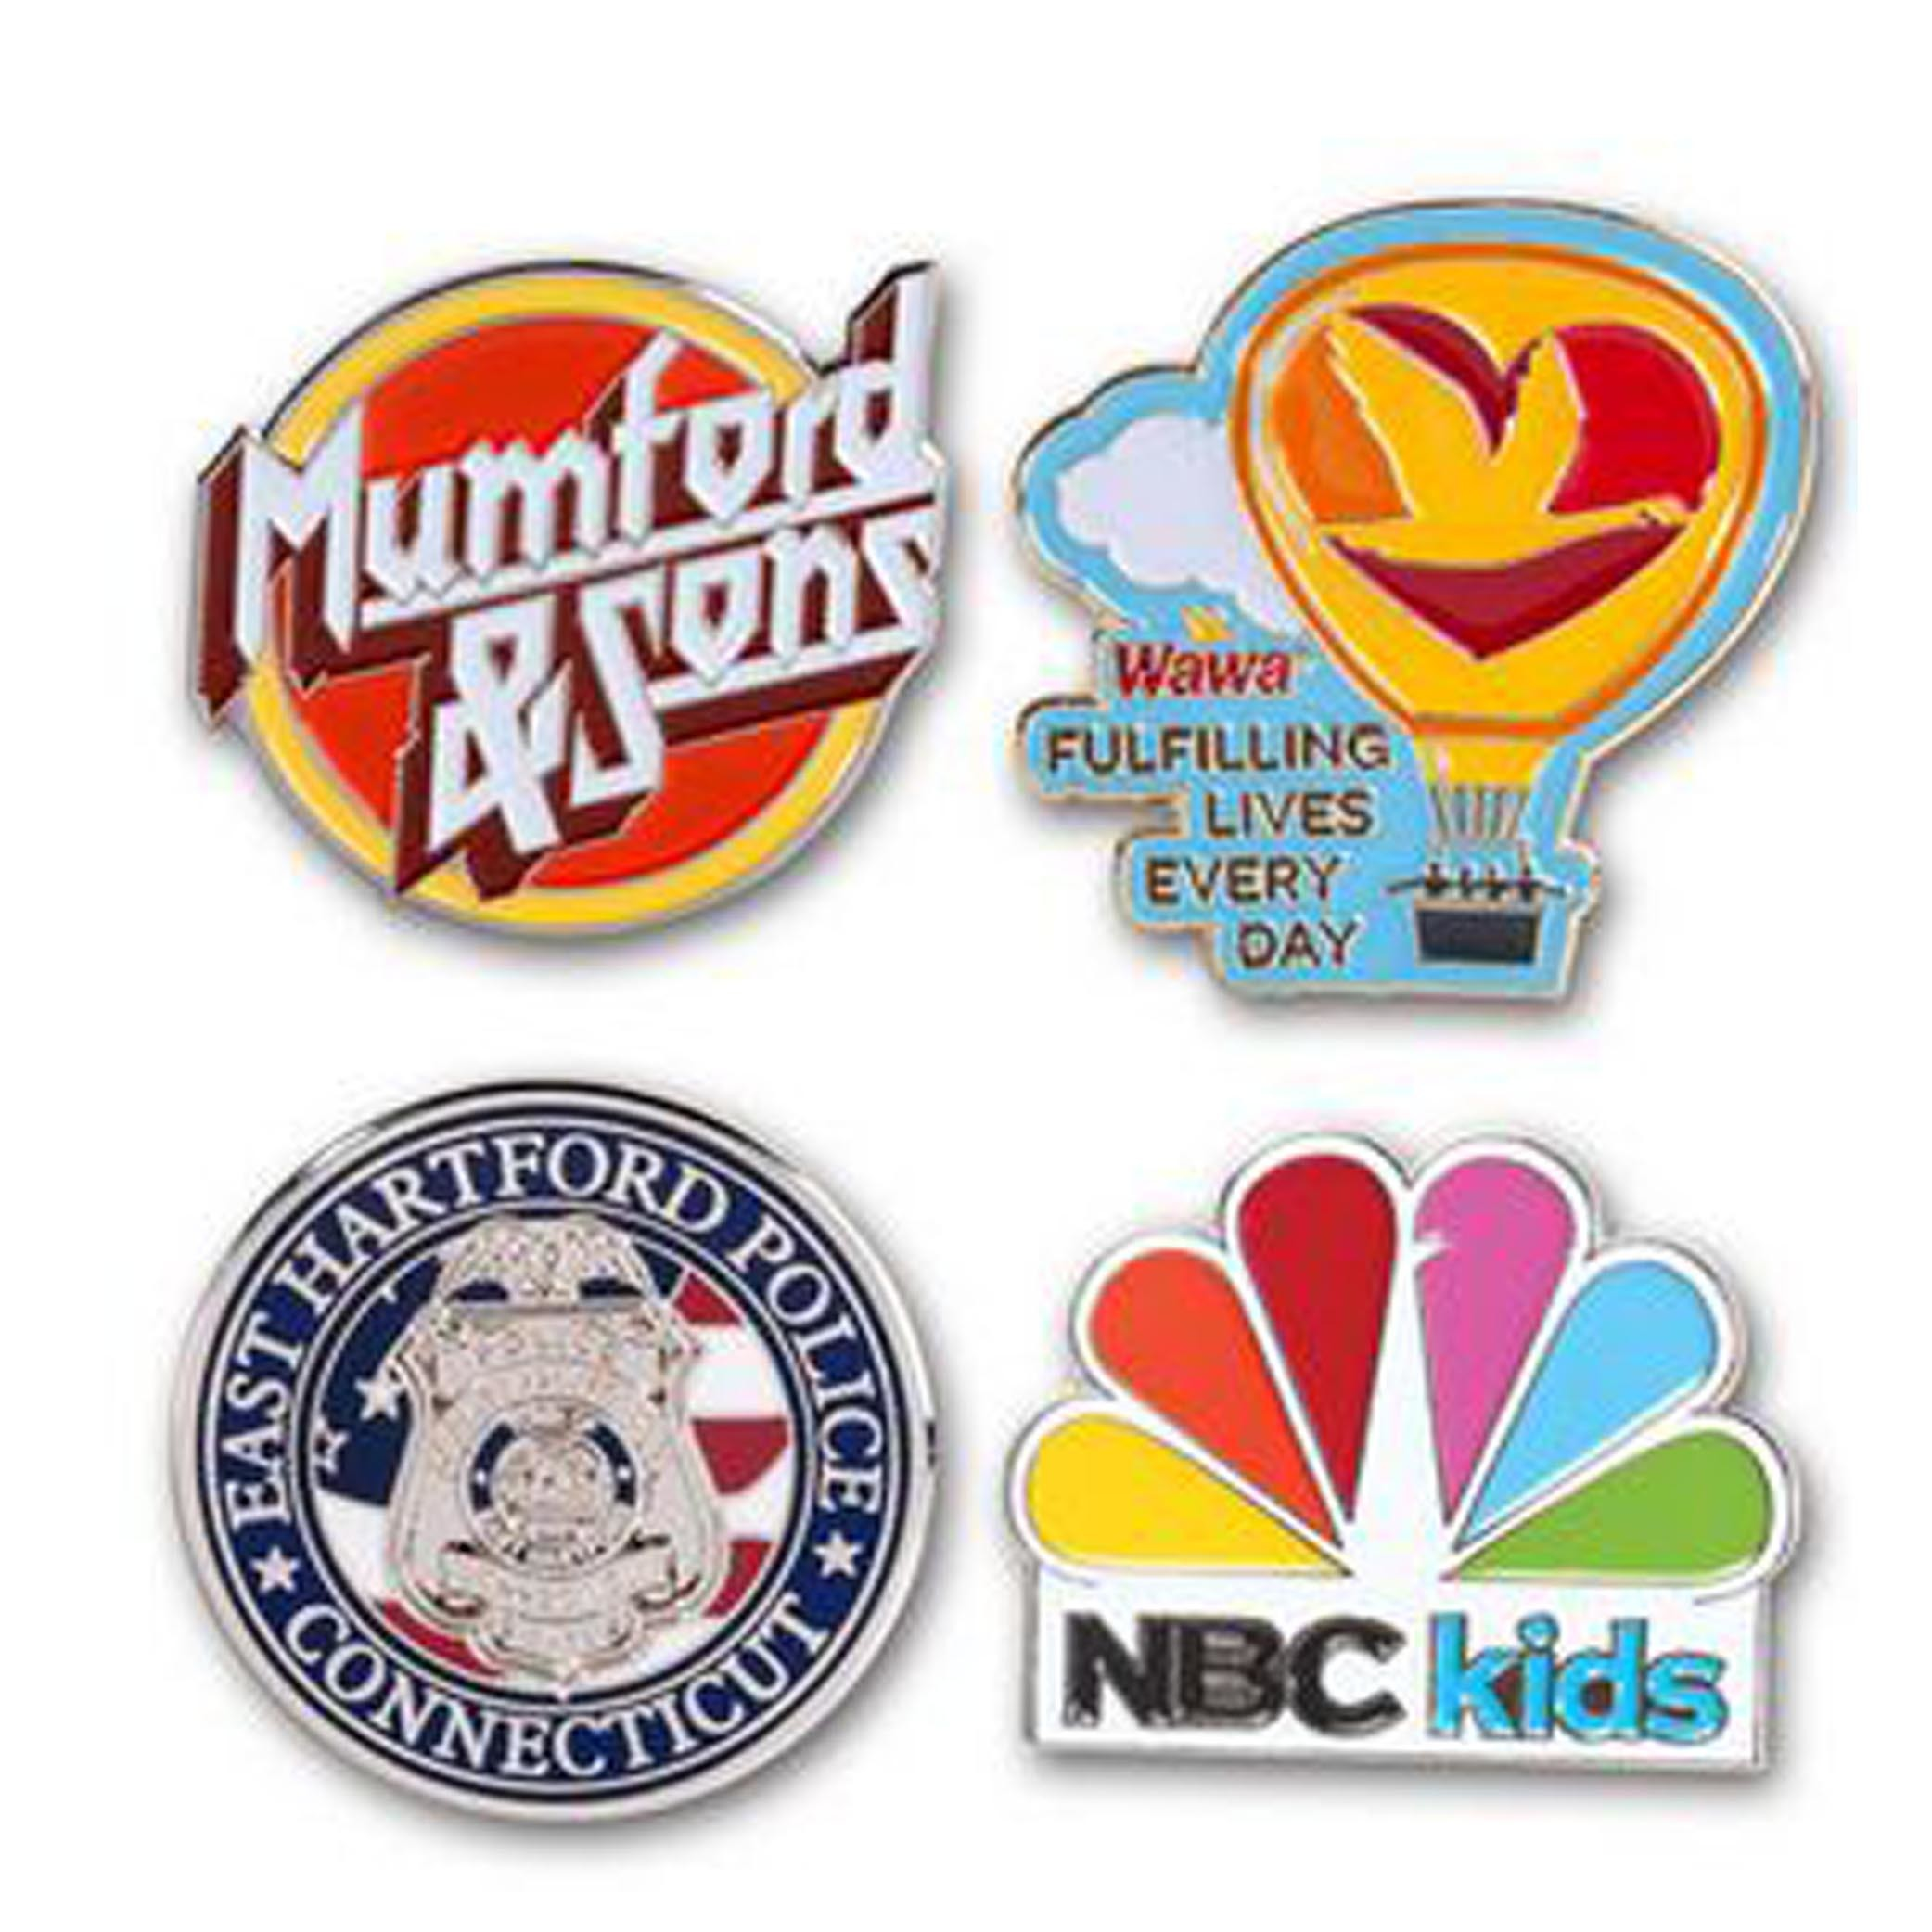 Custom Quality Soft Enamel Lapel Pins Badges Promotion